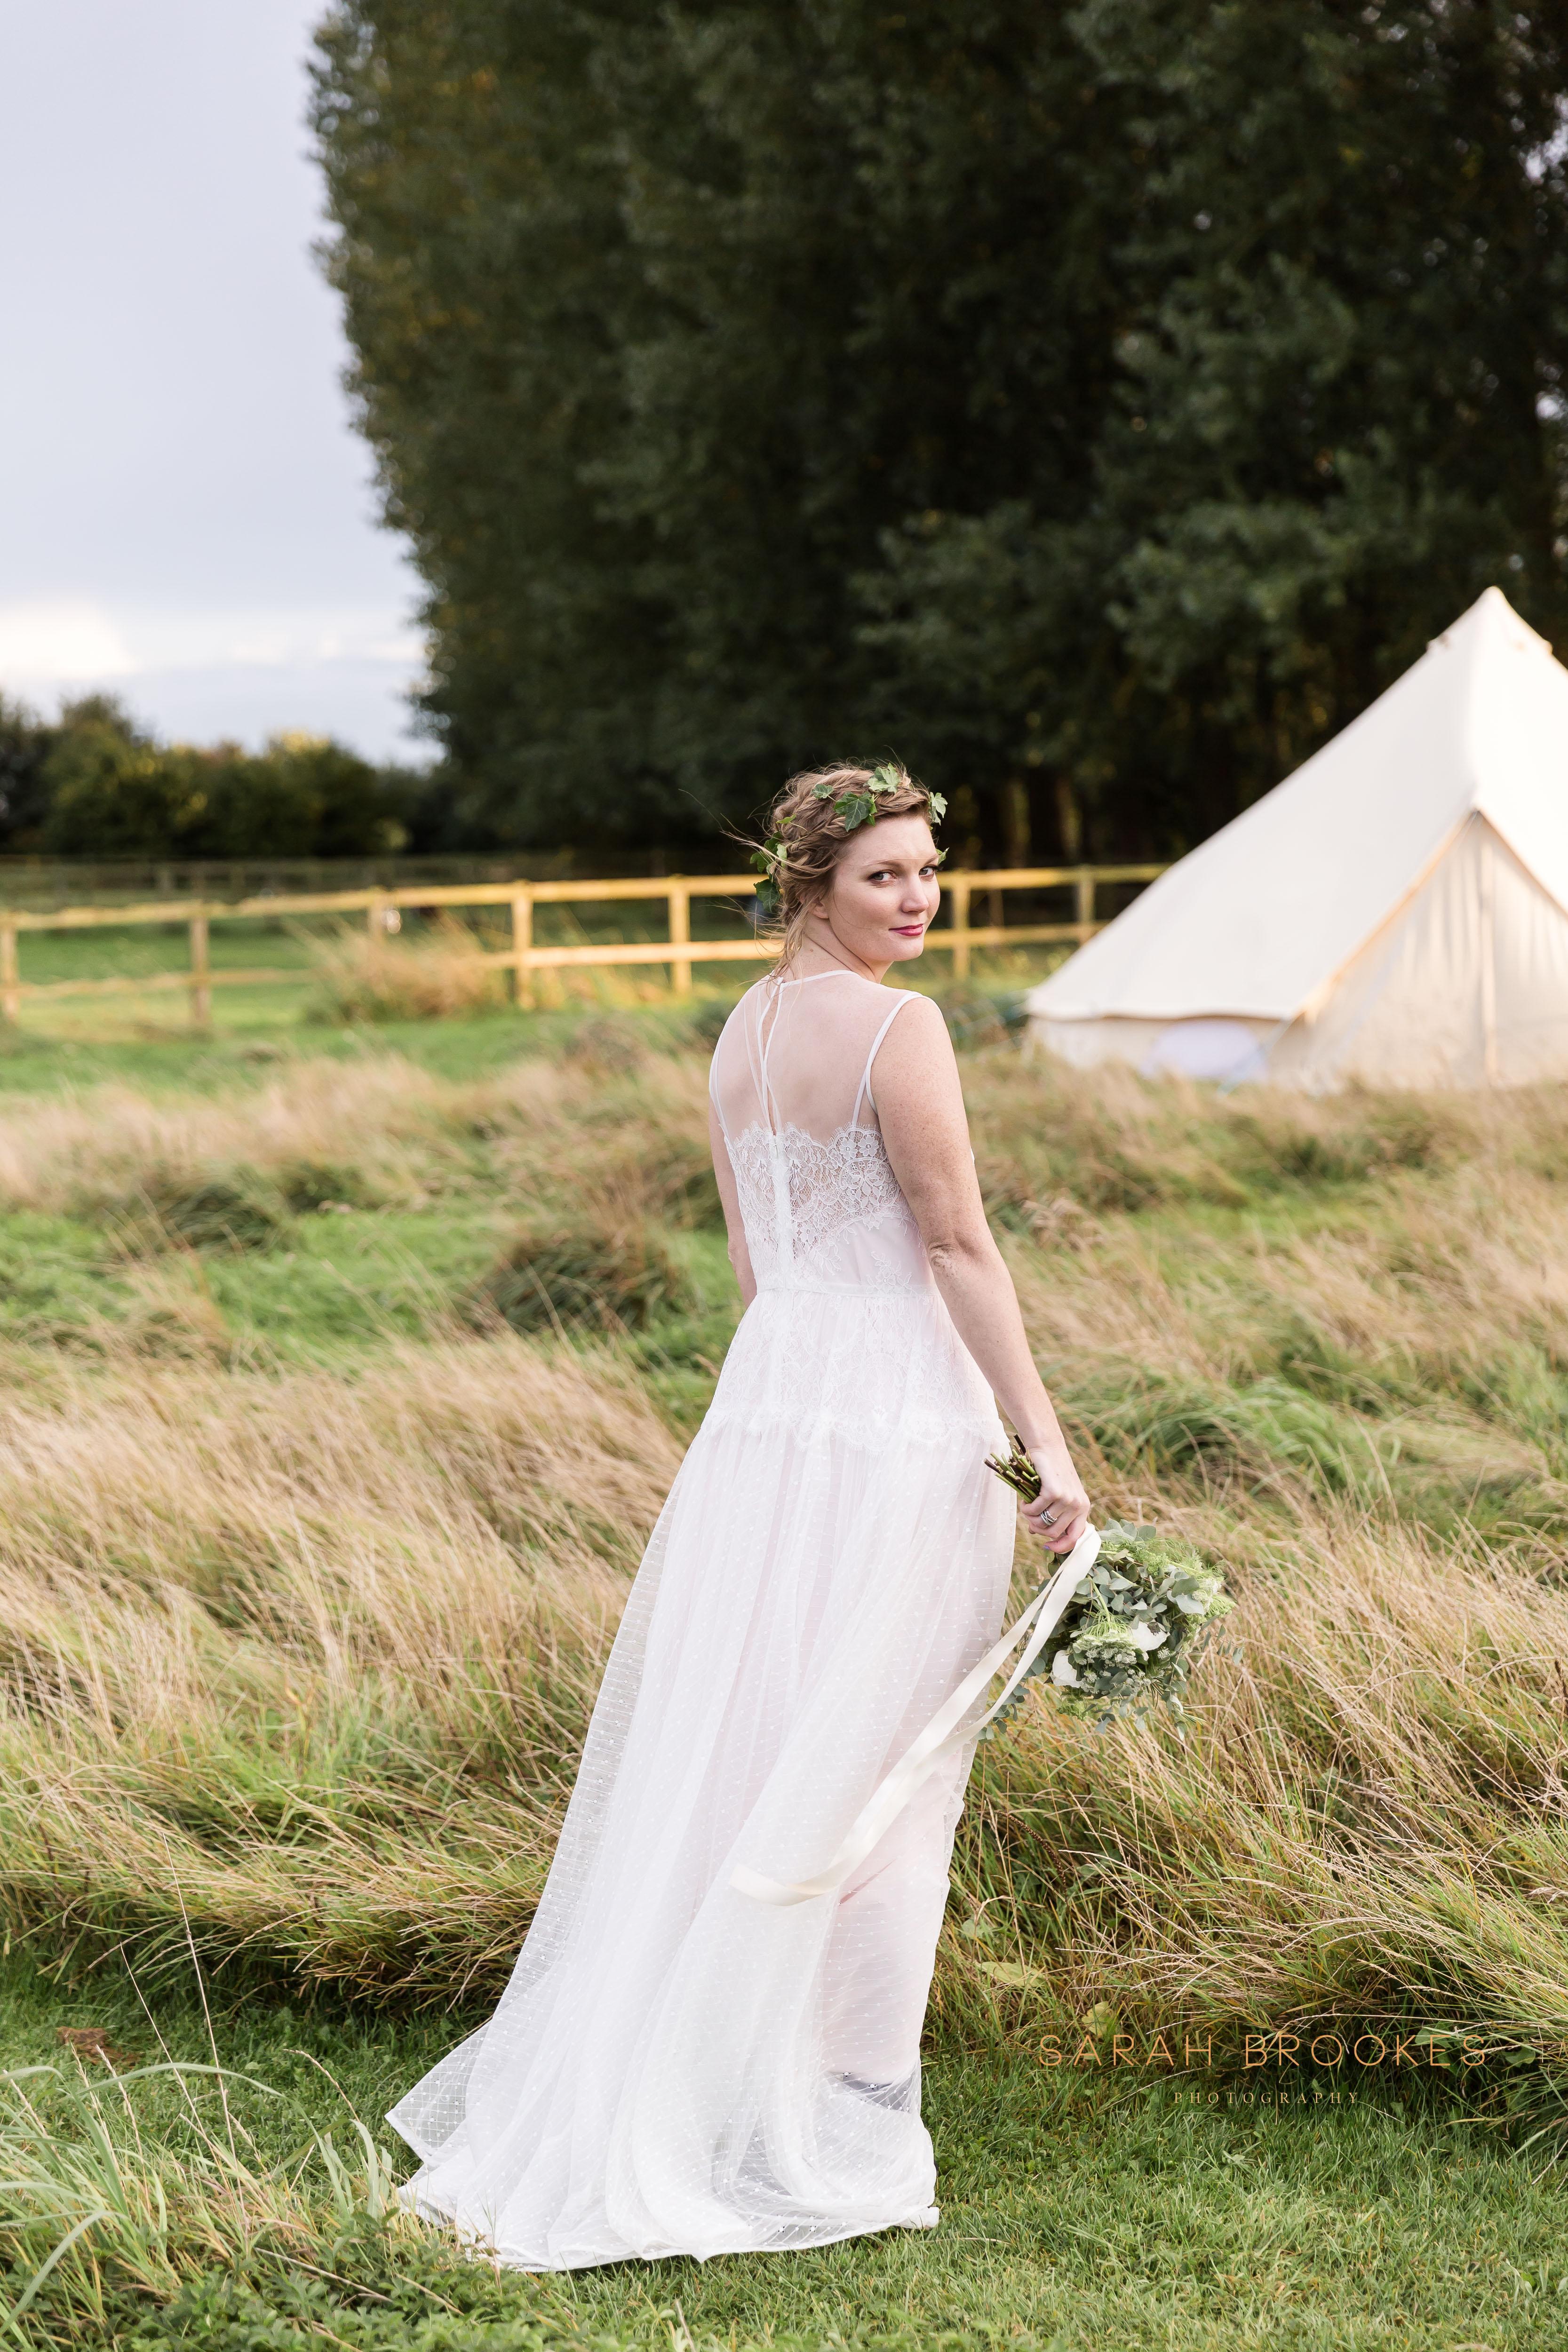 Glampsite Bride